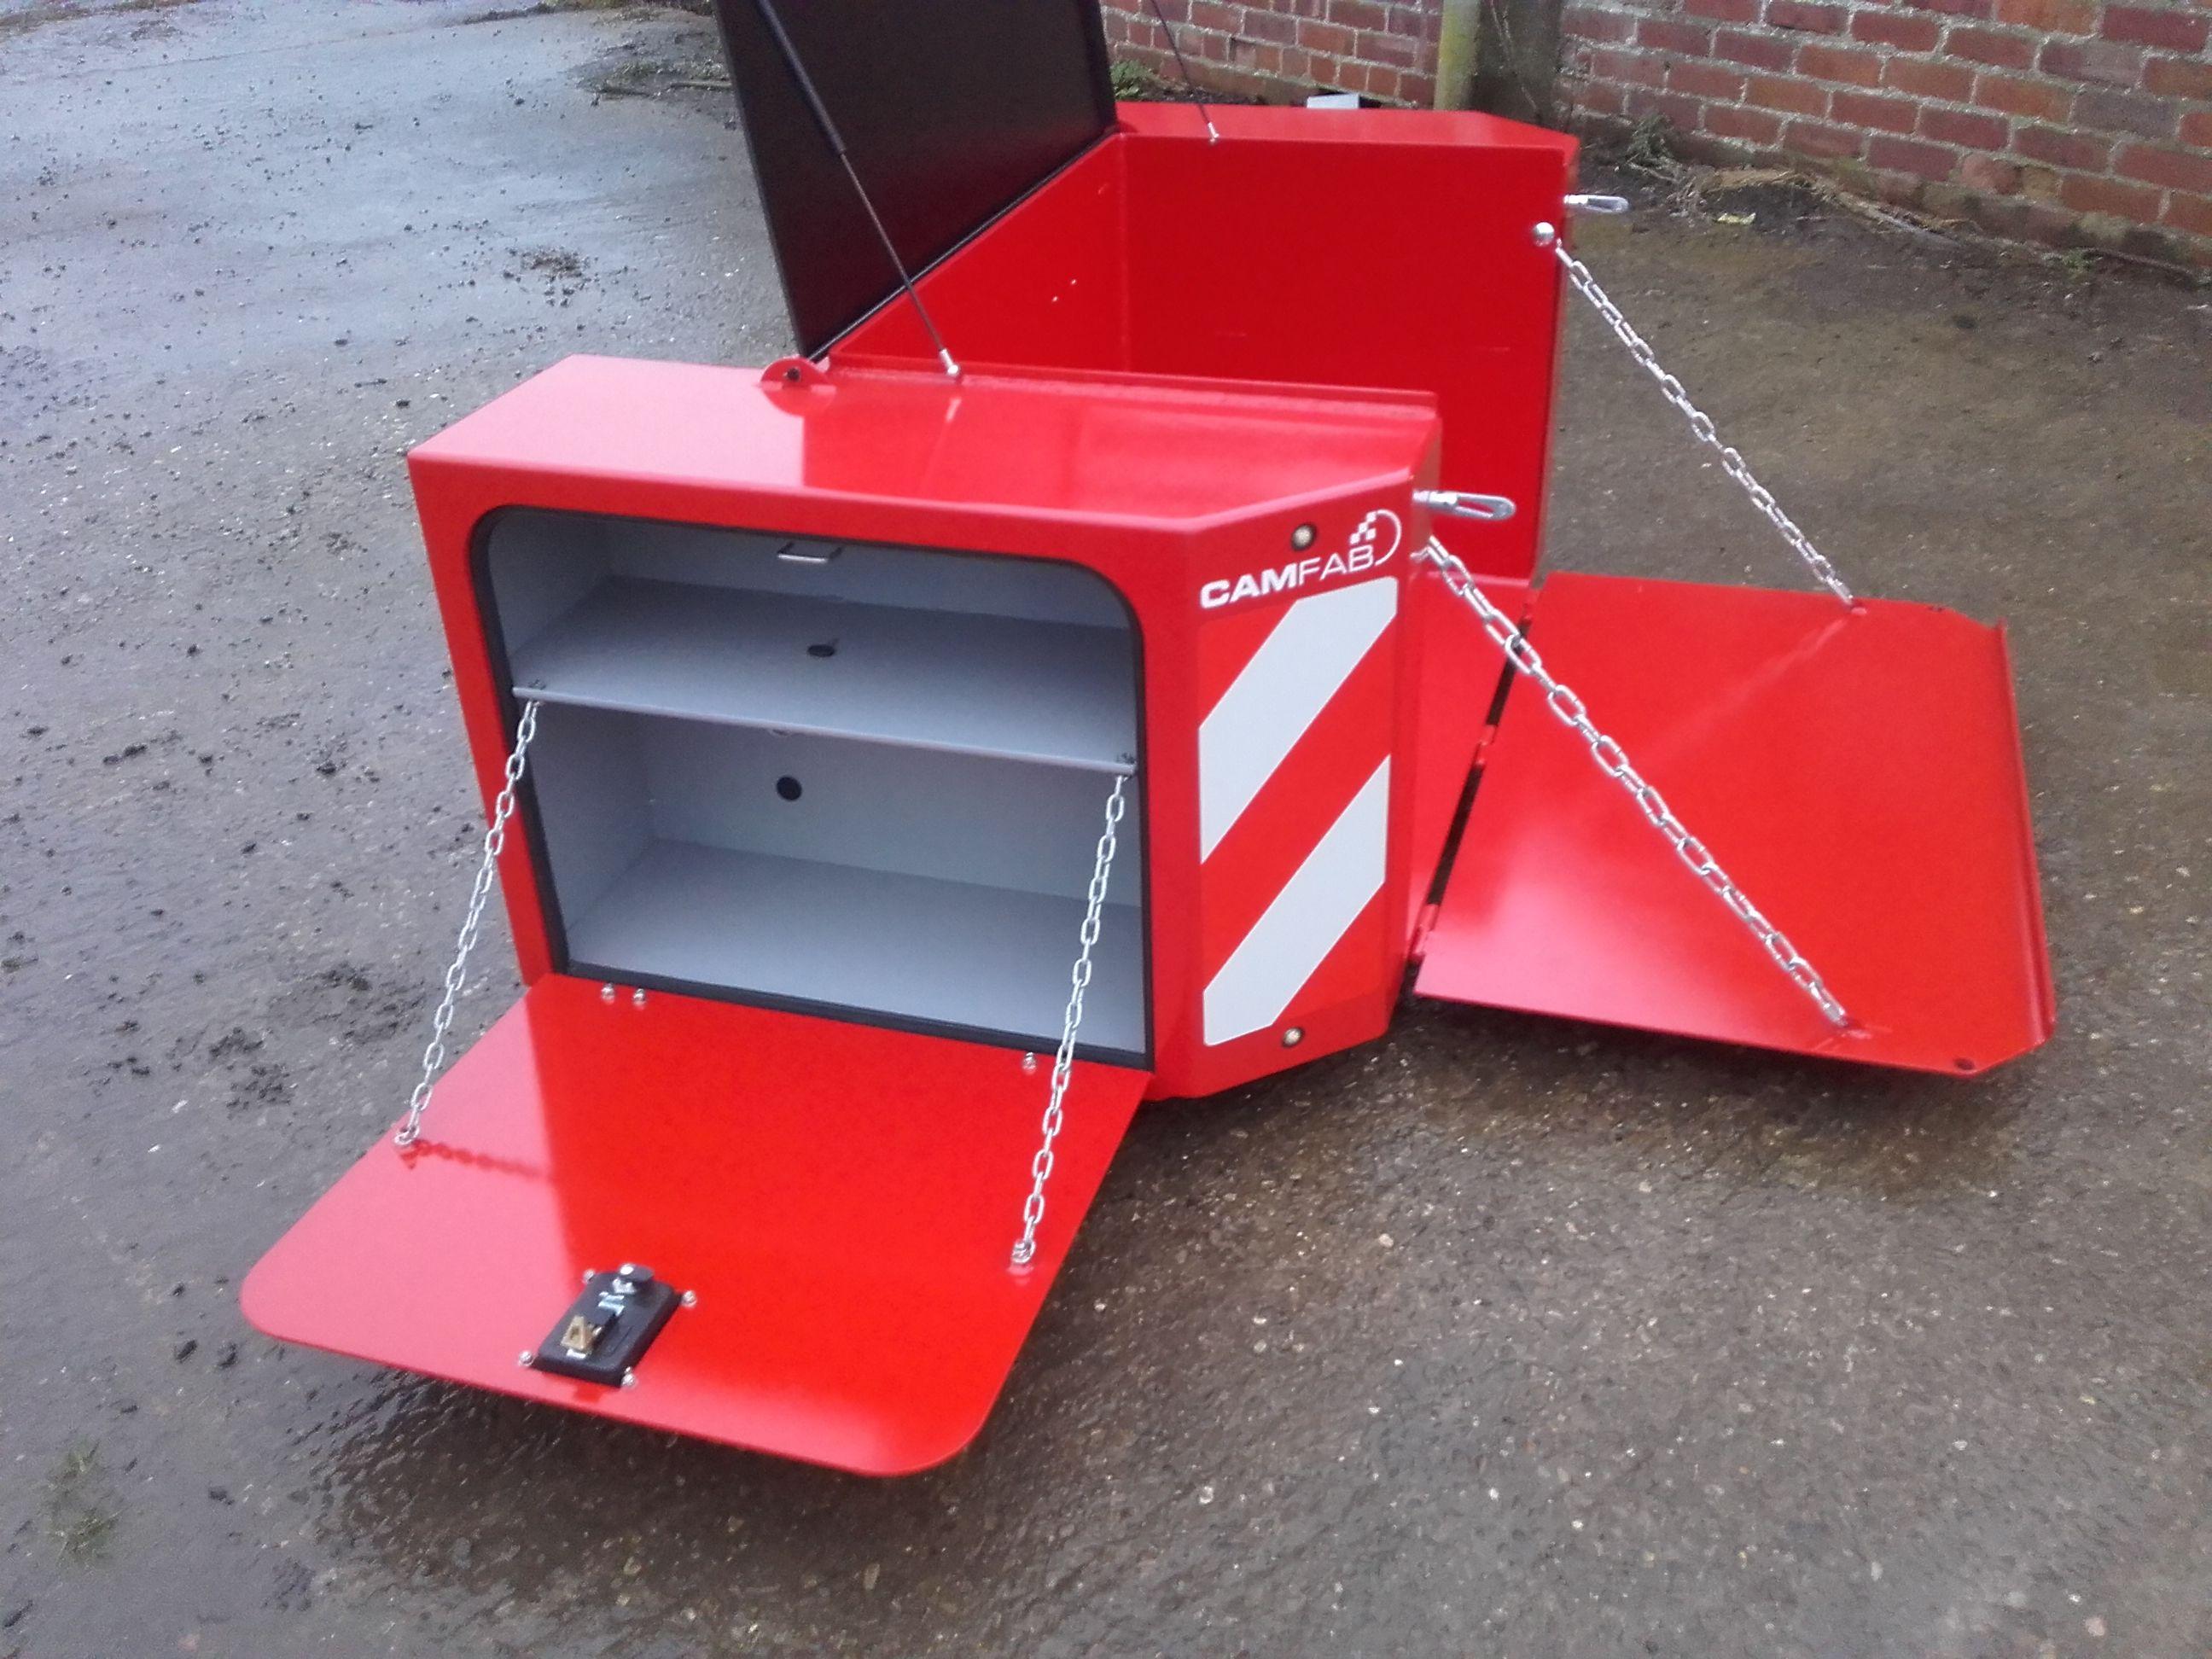 Weight Box Tractor Idea Welding Projects Garage Workshop